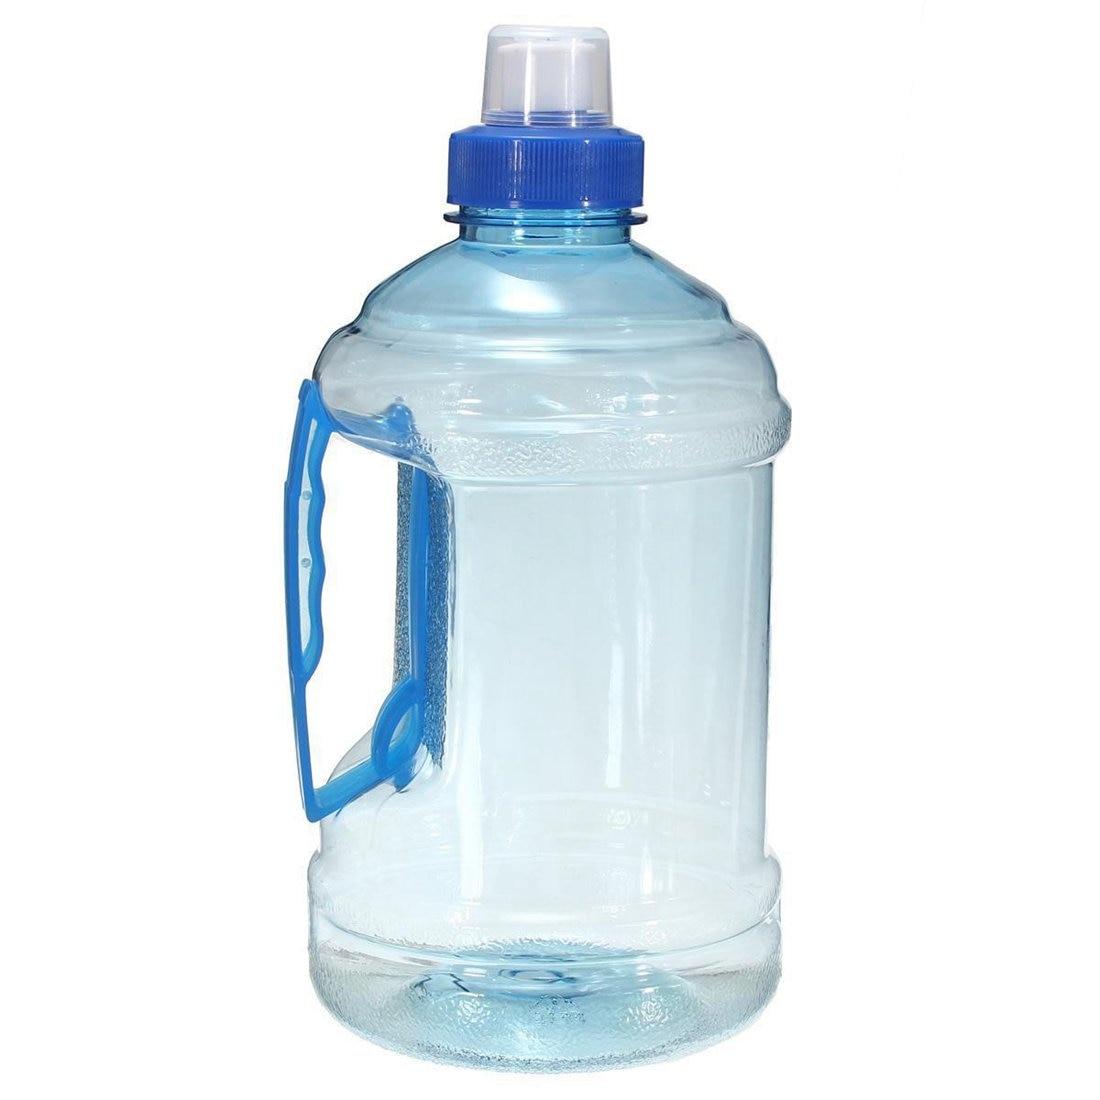 1L Big Large BPA Free Sport Gym Training Party Drink Water Bottle Cap Kettle Color:Blue Capacity:1 L